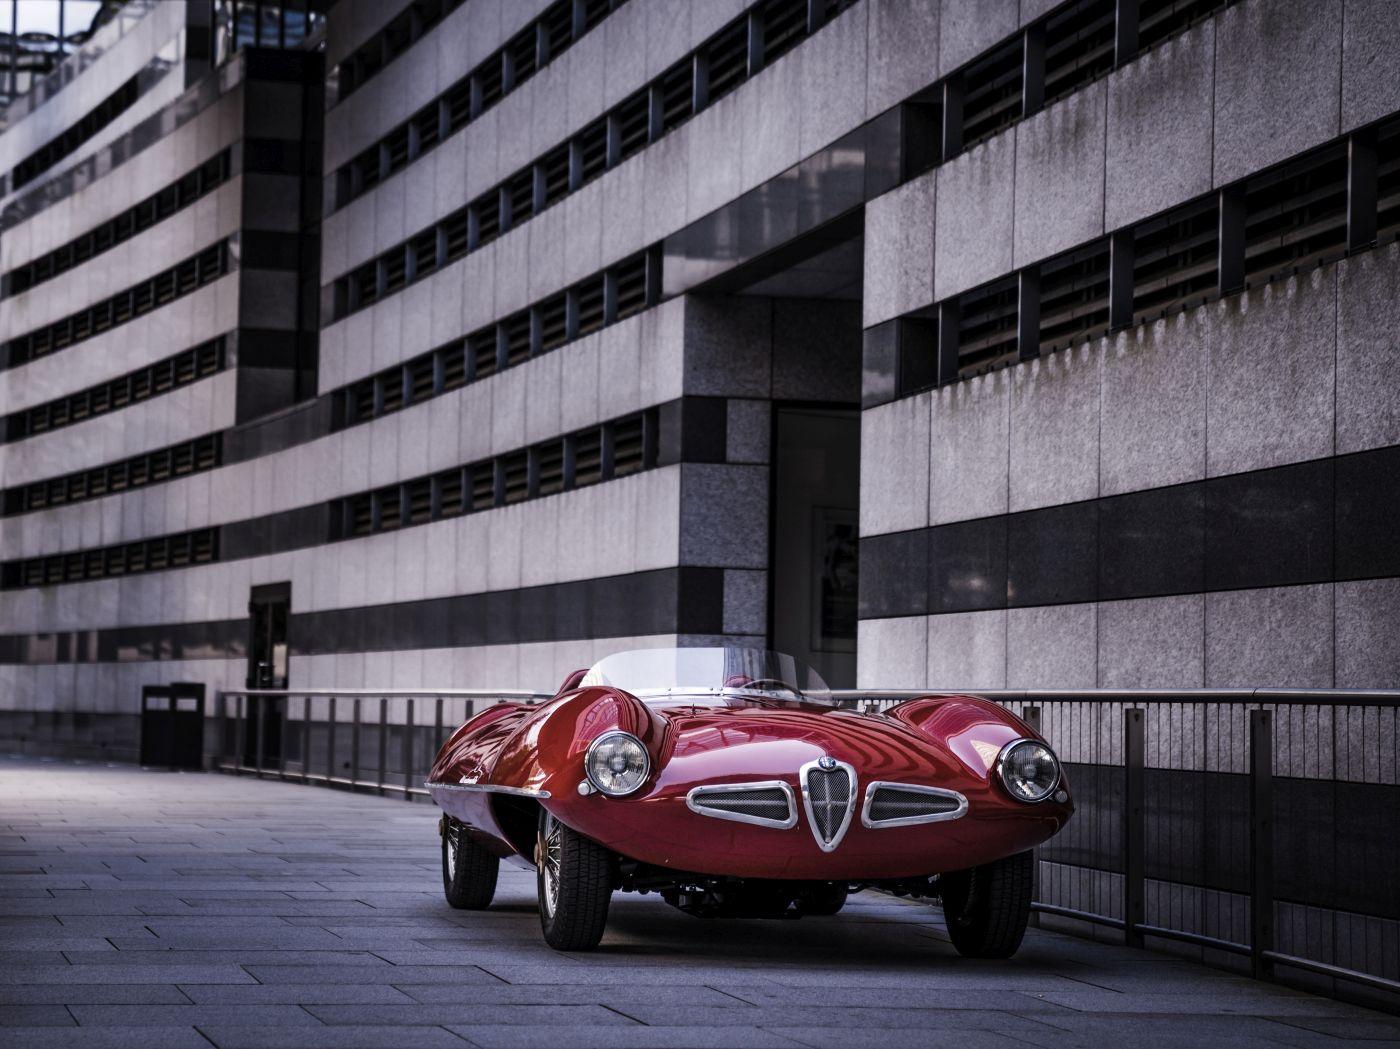 Alfa Romeo Disco Volante DLS_(c)_Kirill_Kirsanov (4)